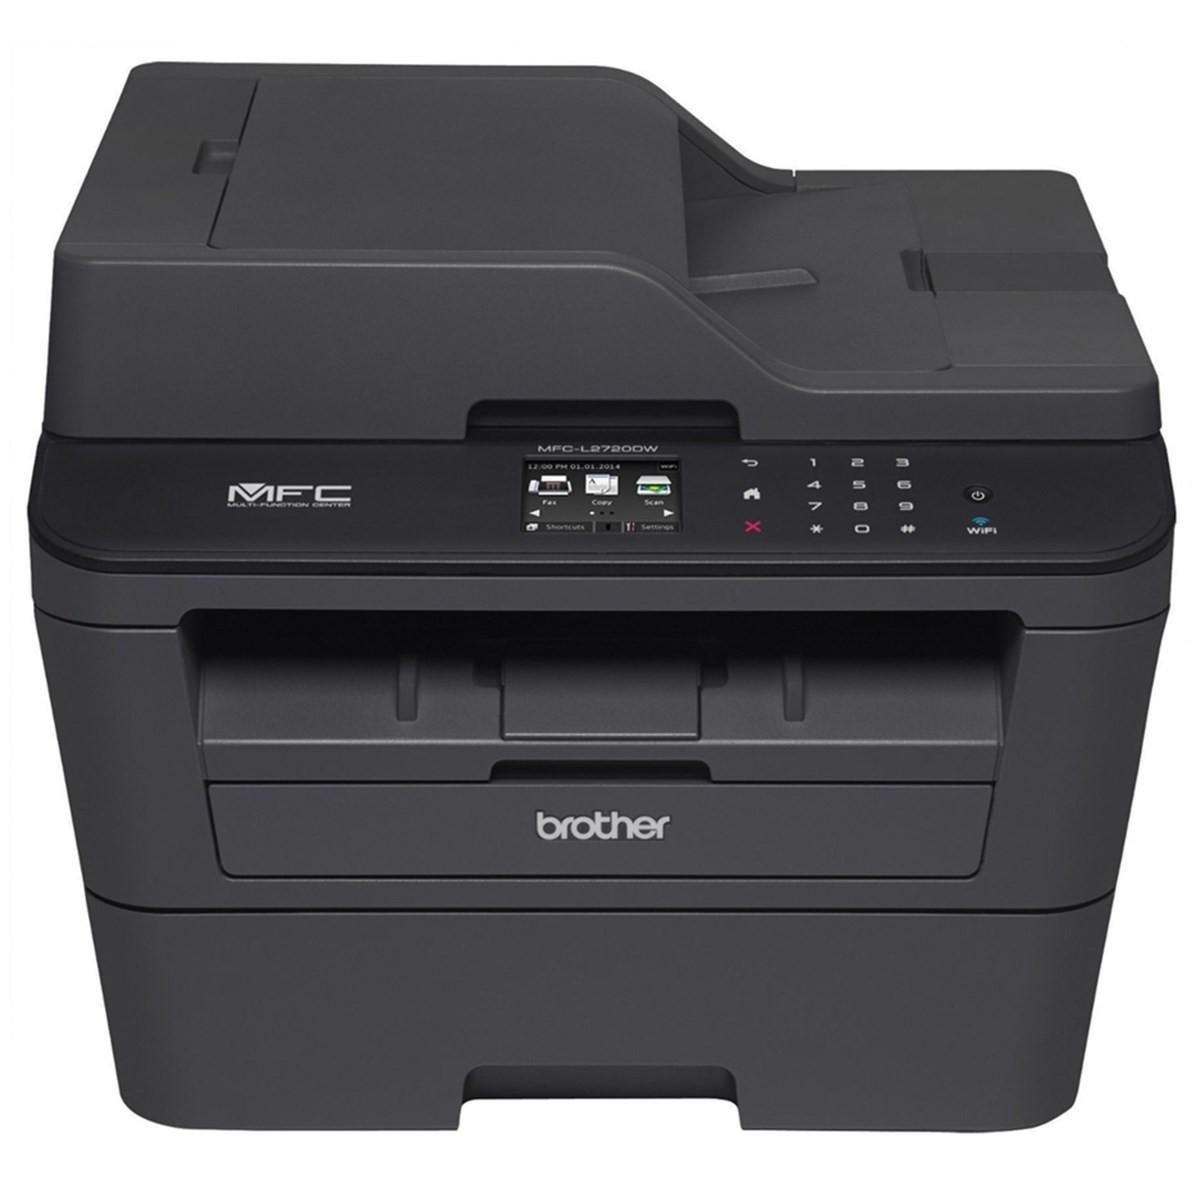 Impressora Brother MFC-L2720DW MFCL2720 Multifuncional Laser Monocromática com Wireless e Duplex